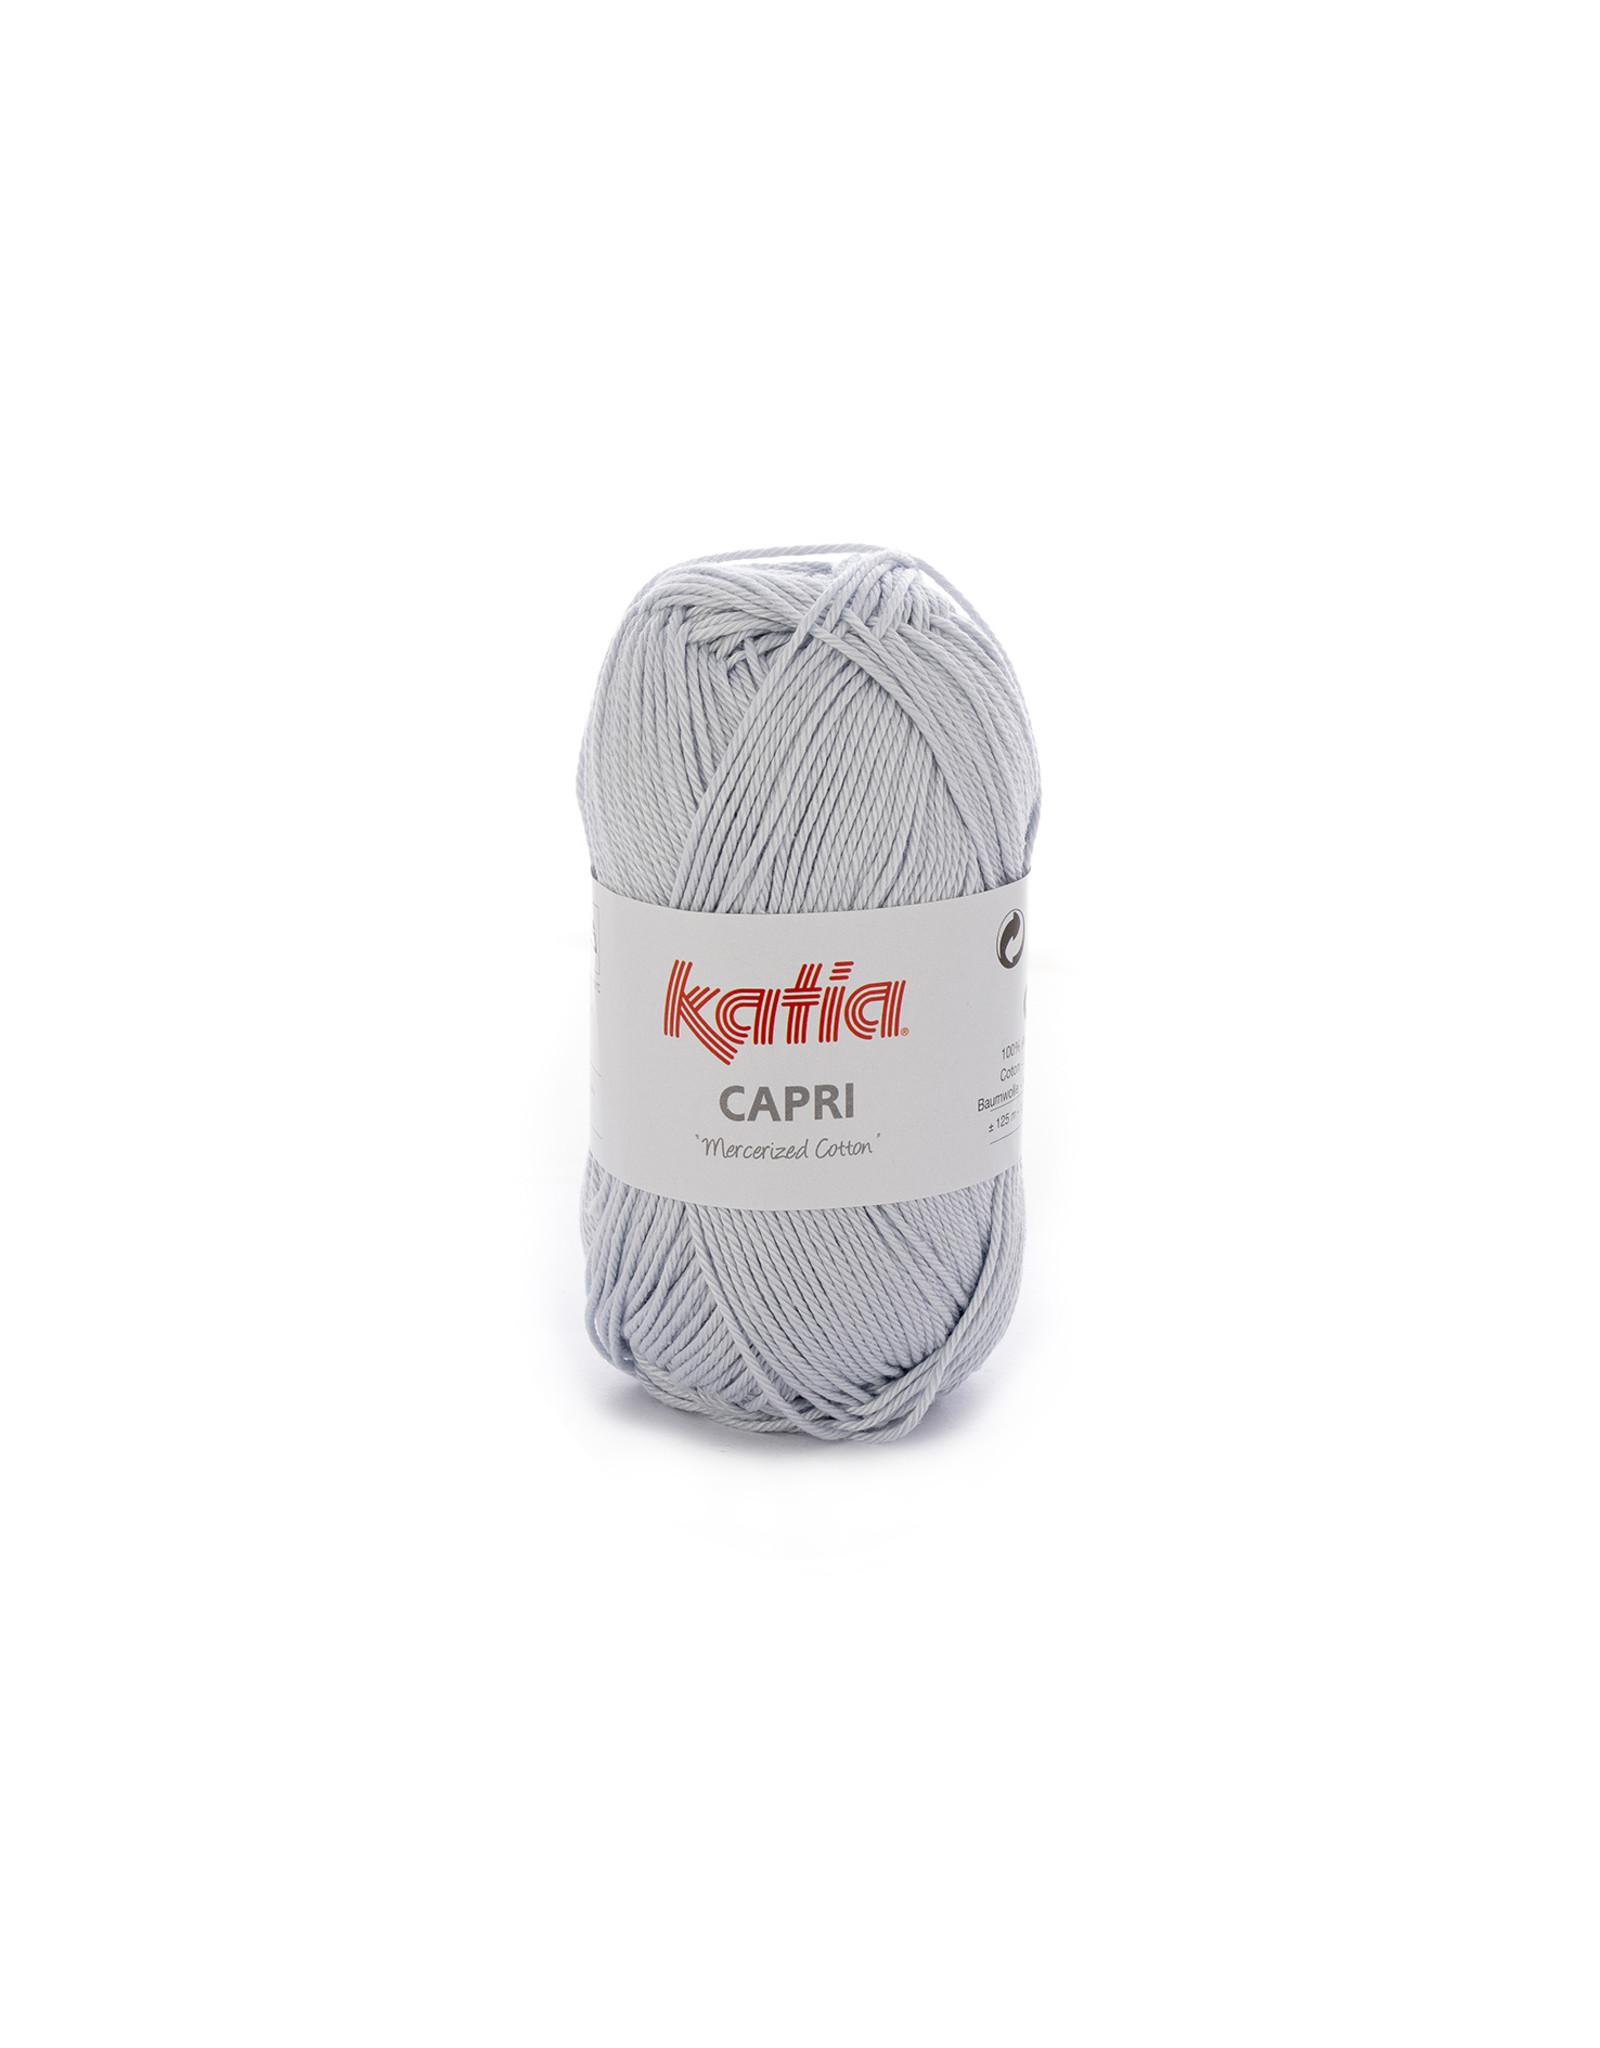 Katia Katia Capri - kleur 157 Parelwit - 50 gr. = 125 m. - 100% katoen